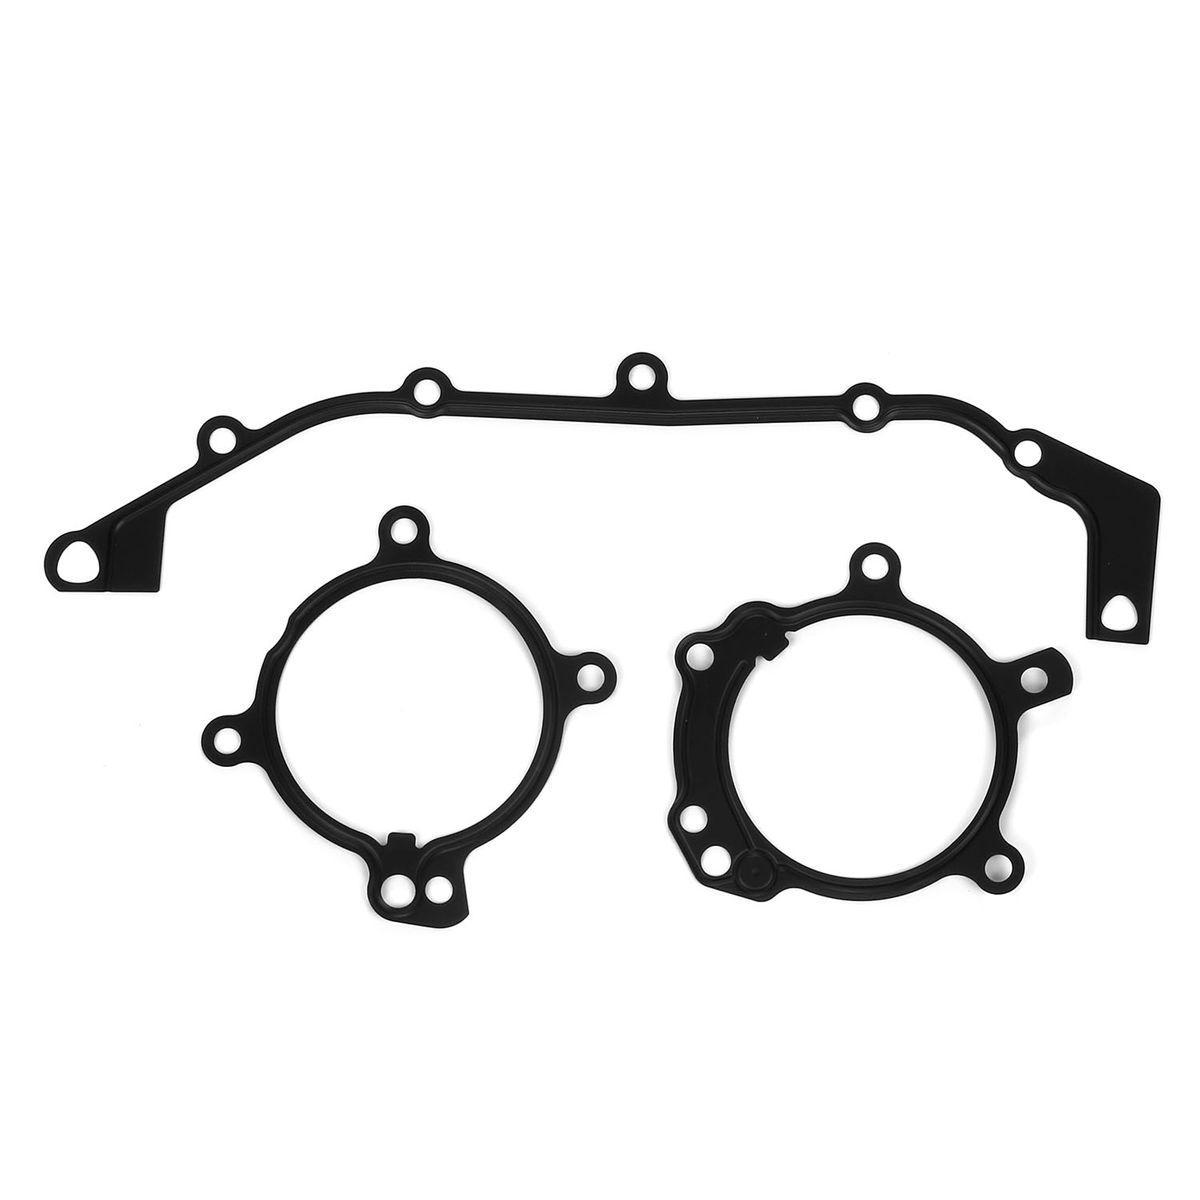 Bmw Z3 Window Seals: Fits BMW 3 SERIES E46 M54 M52tu VCG DUAL VANOS O-Ring Seal